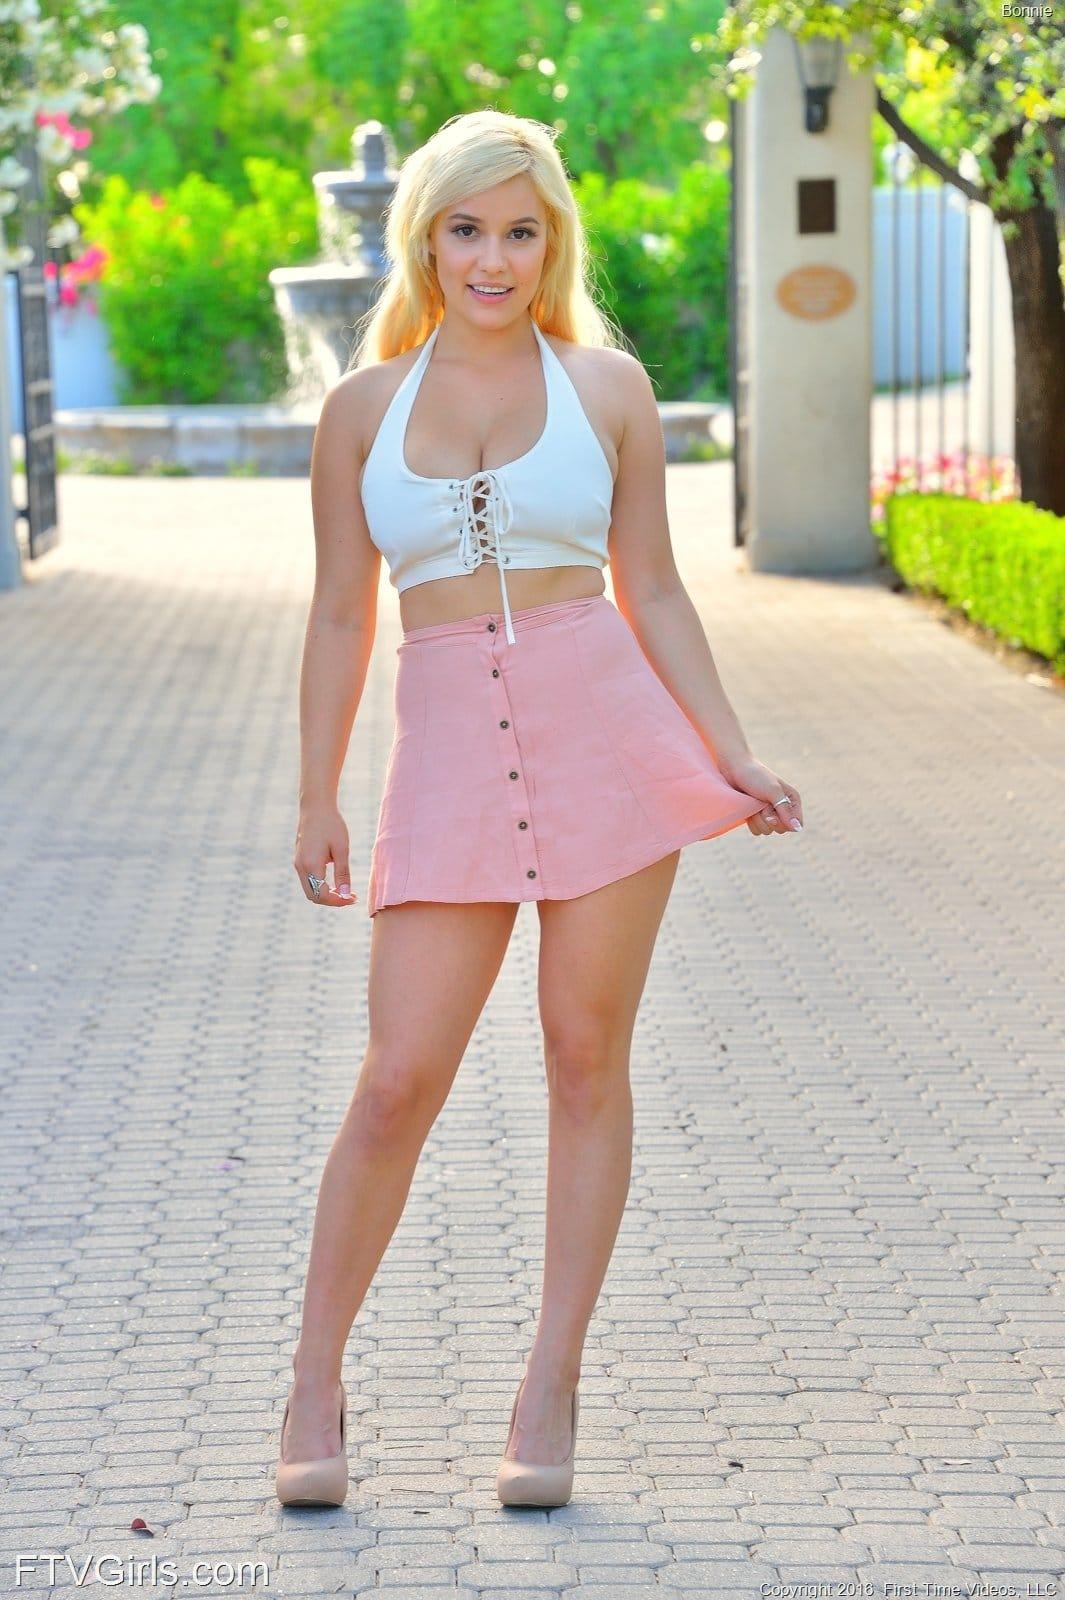 Busen Erotik-Fotomodell Bonnie - Erotik-Model-Blog